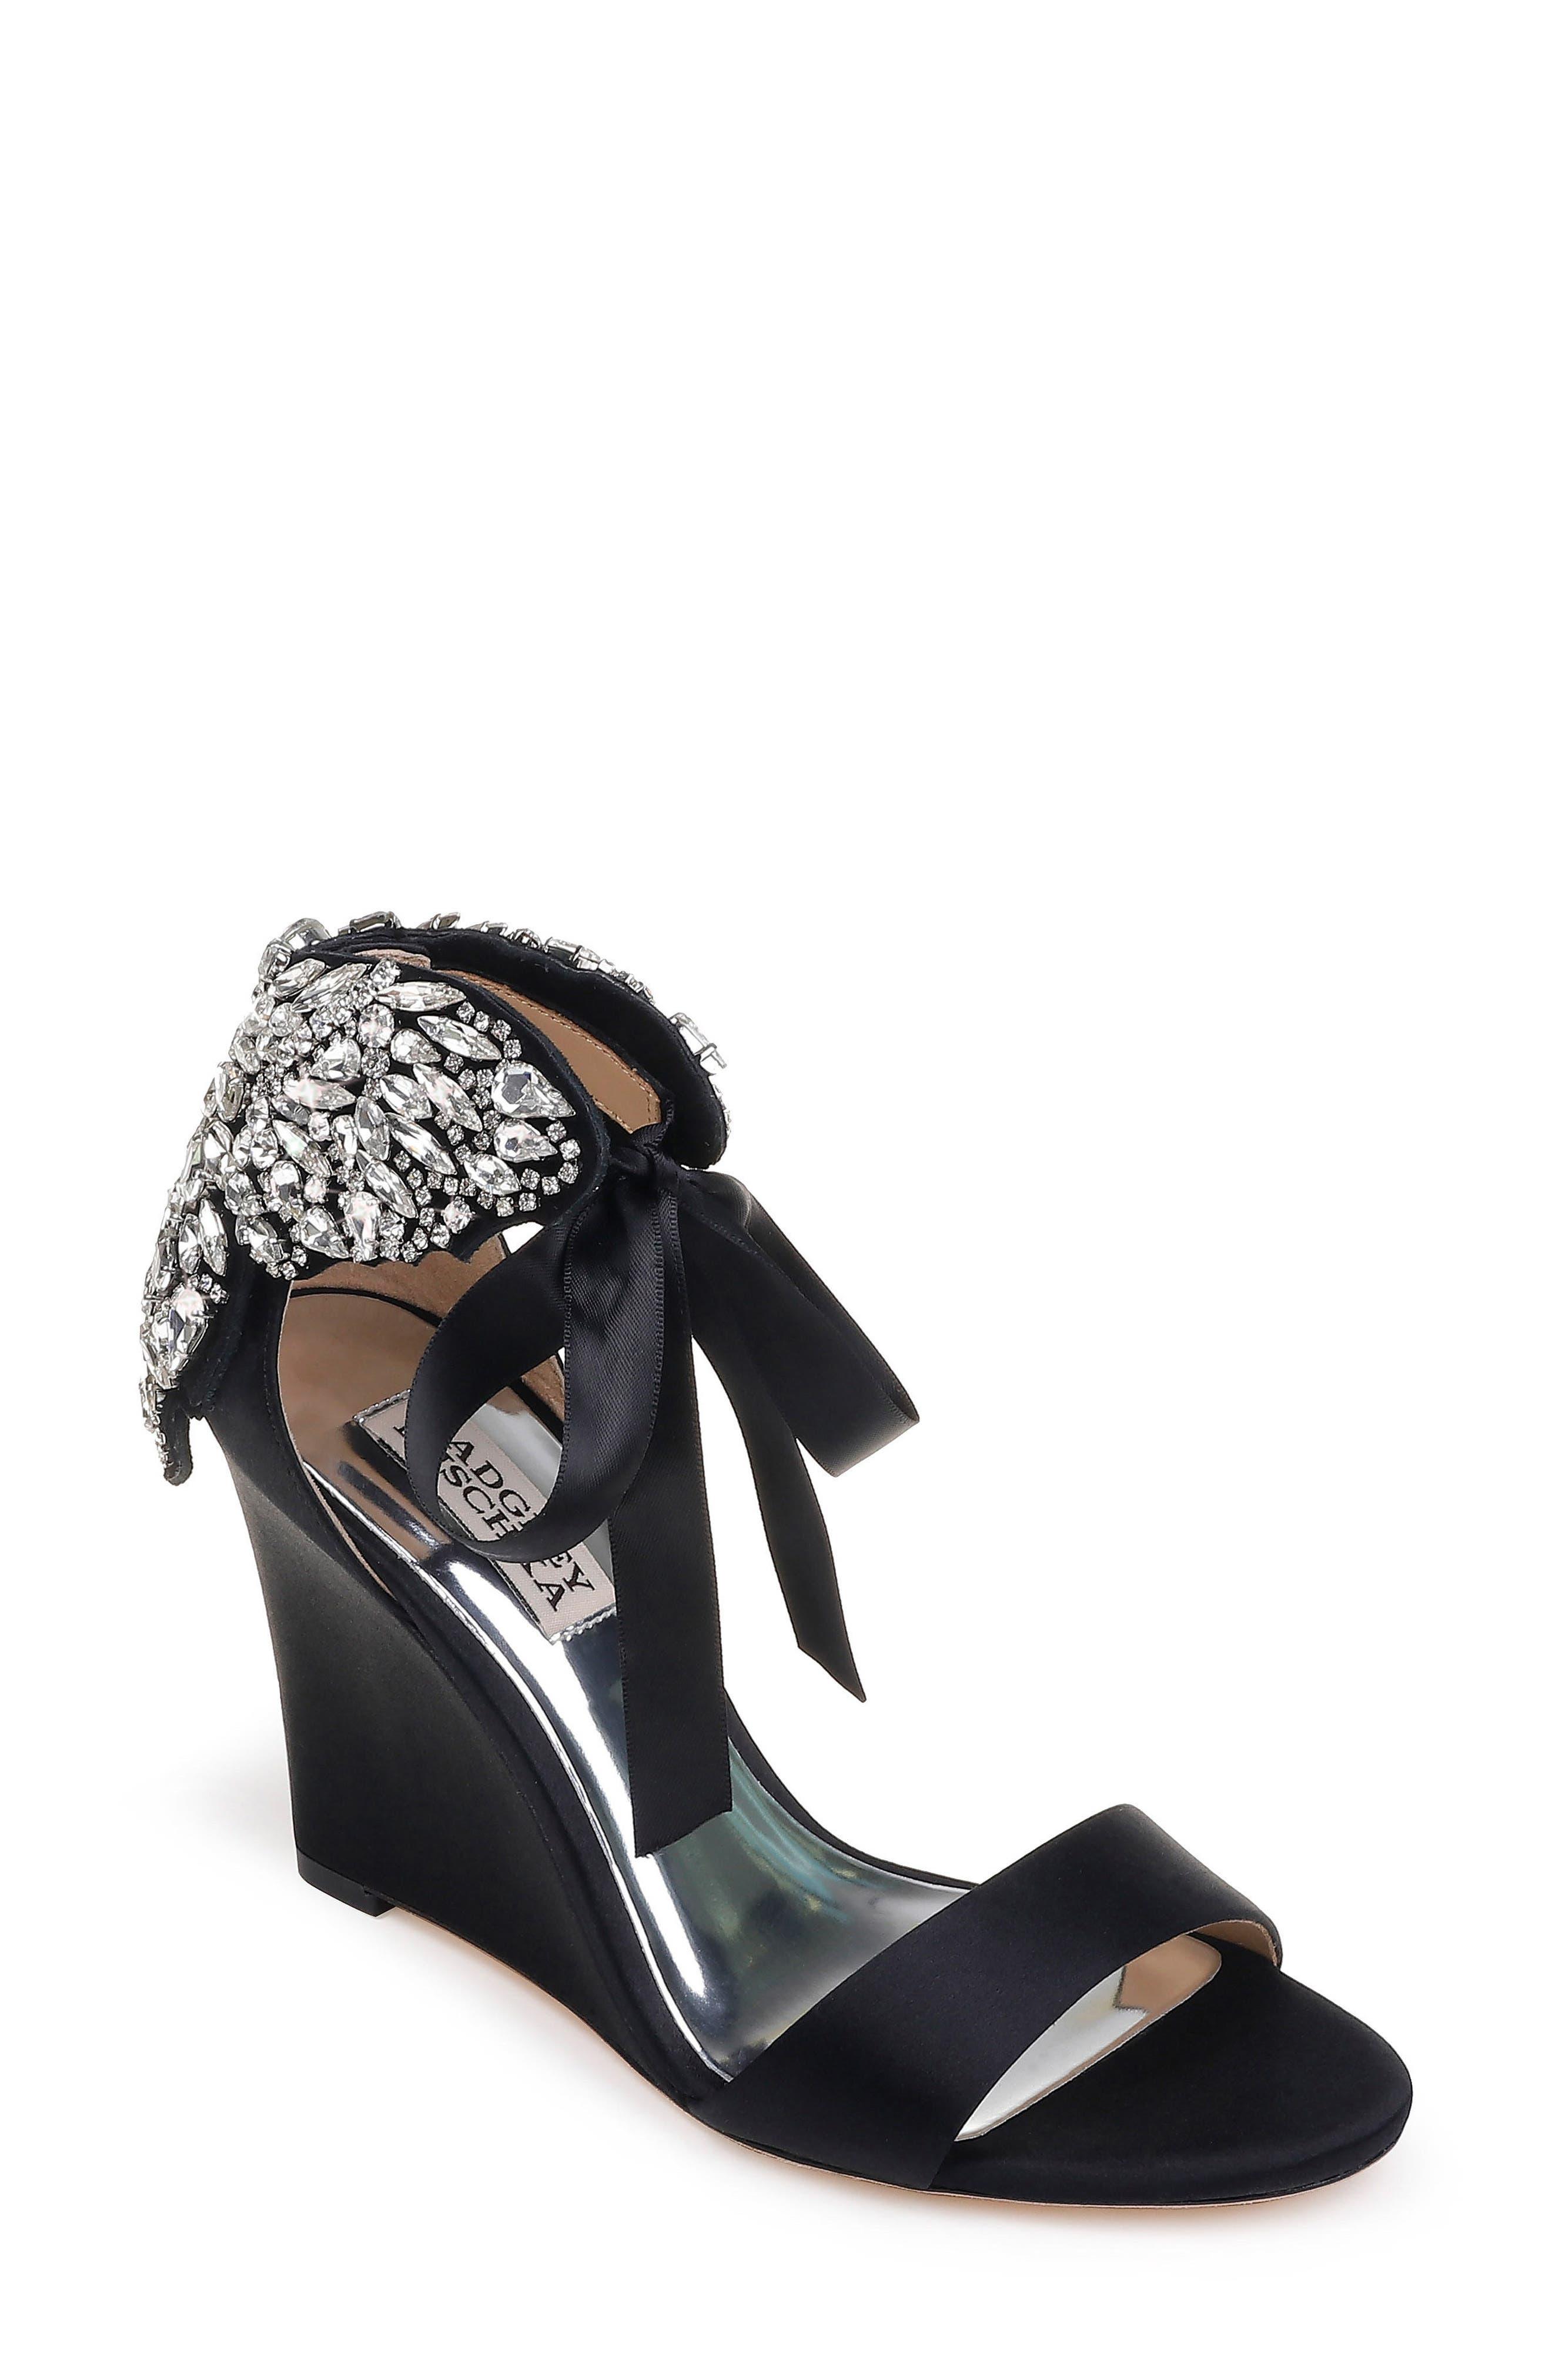 Badgley Mischka Heather Crystal Embellished Wedge, Main, color, BLACK SATIN